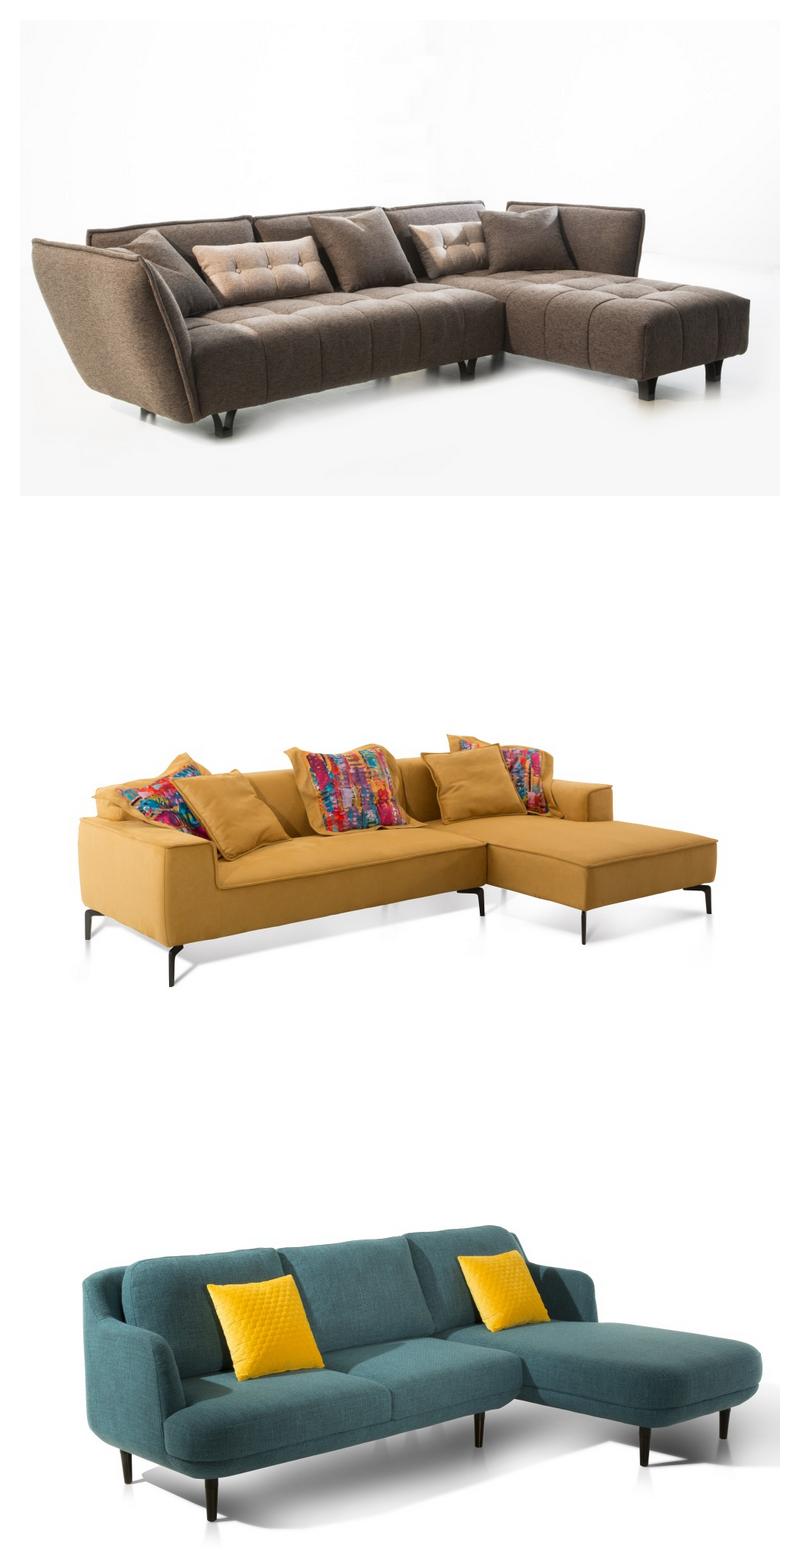 New Design Modern Sofa From Cocheen Sofaset Sofa Modernsofa Cocheendesign Livingroomsofa Furniture Newdesign Sectionalsofa Homefu Myagkaya Mebel Mebel